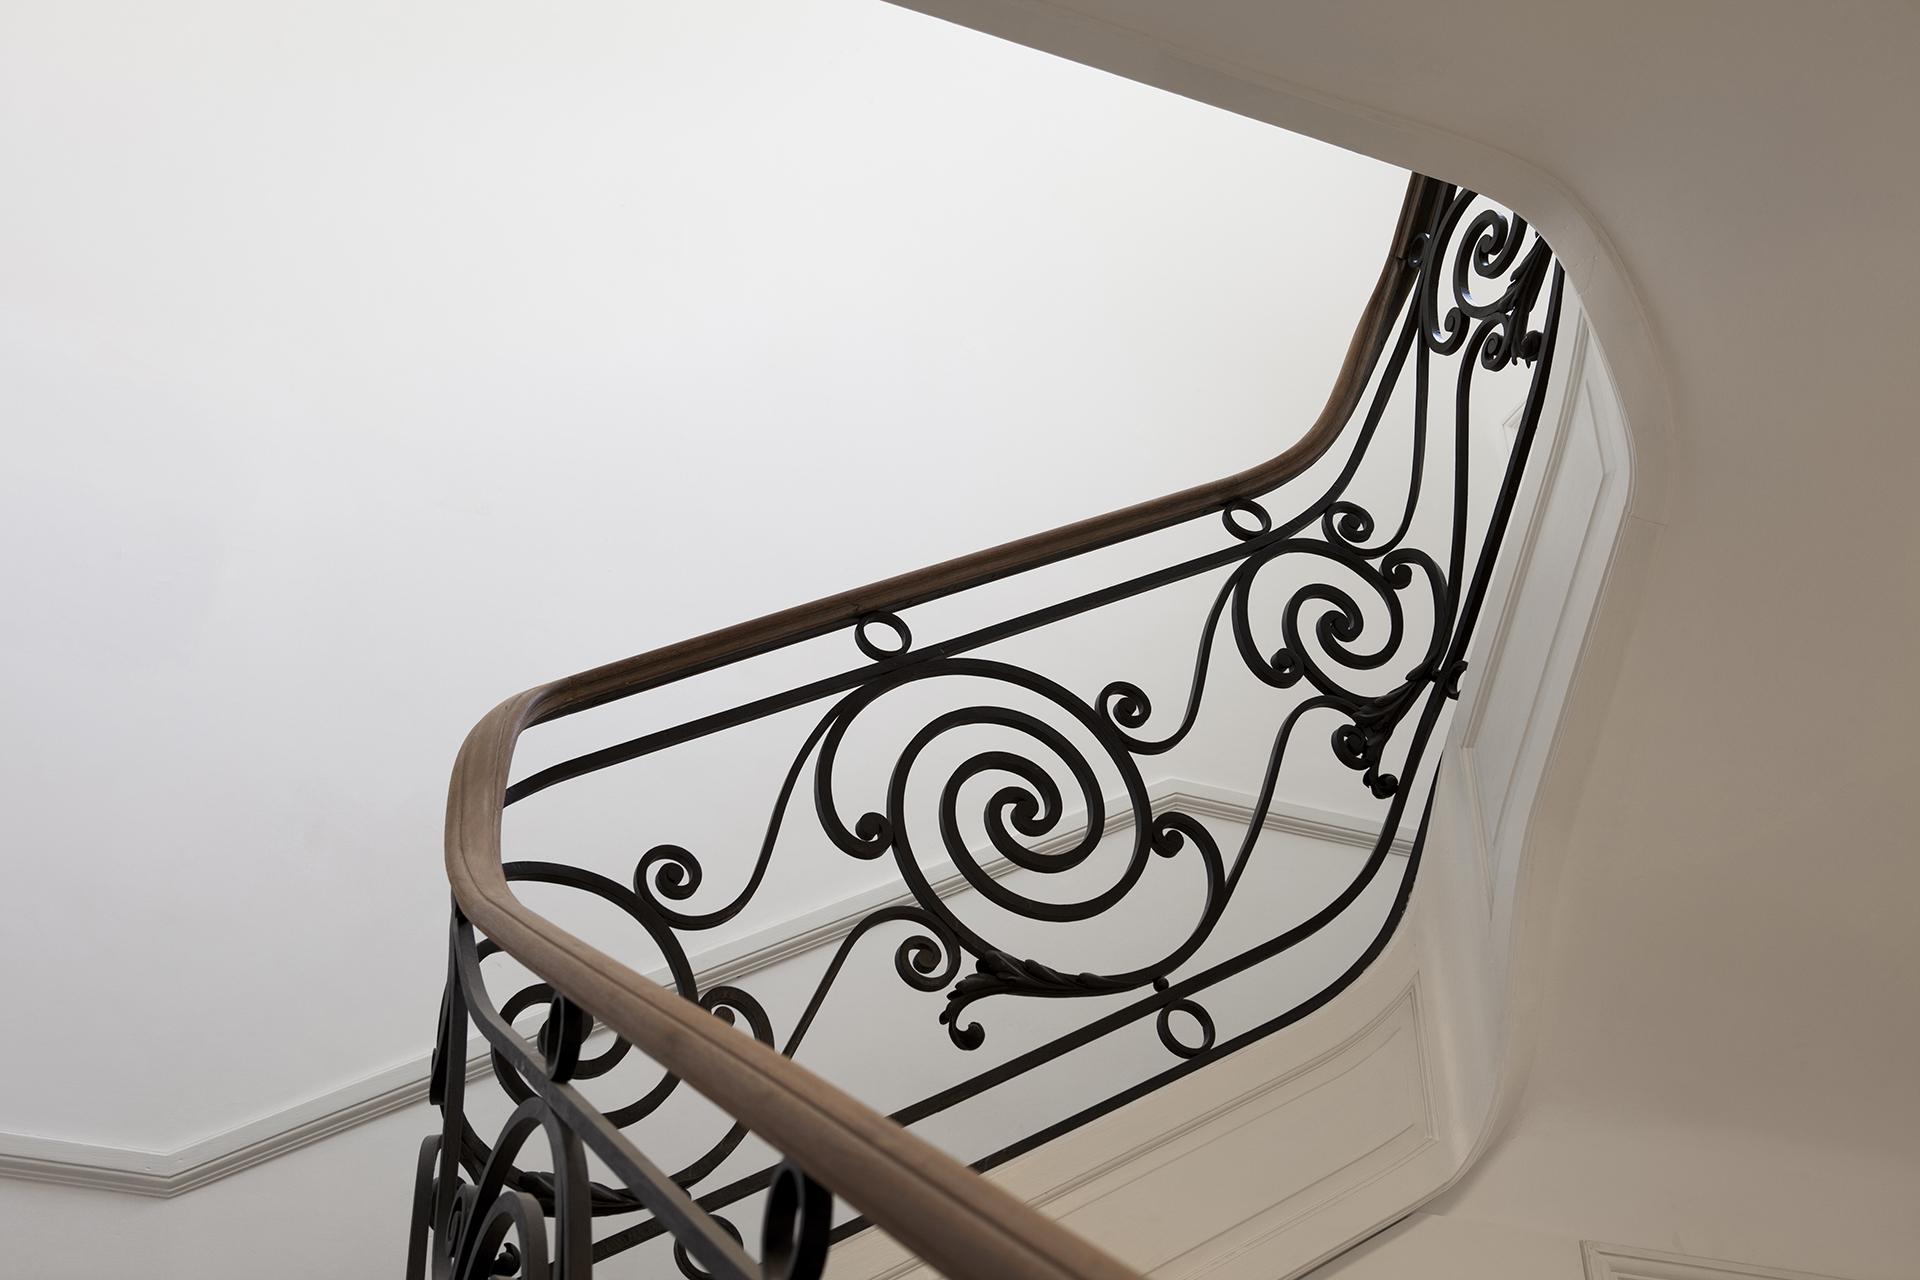 Casa_Cavia_staircase_01.JPG